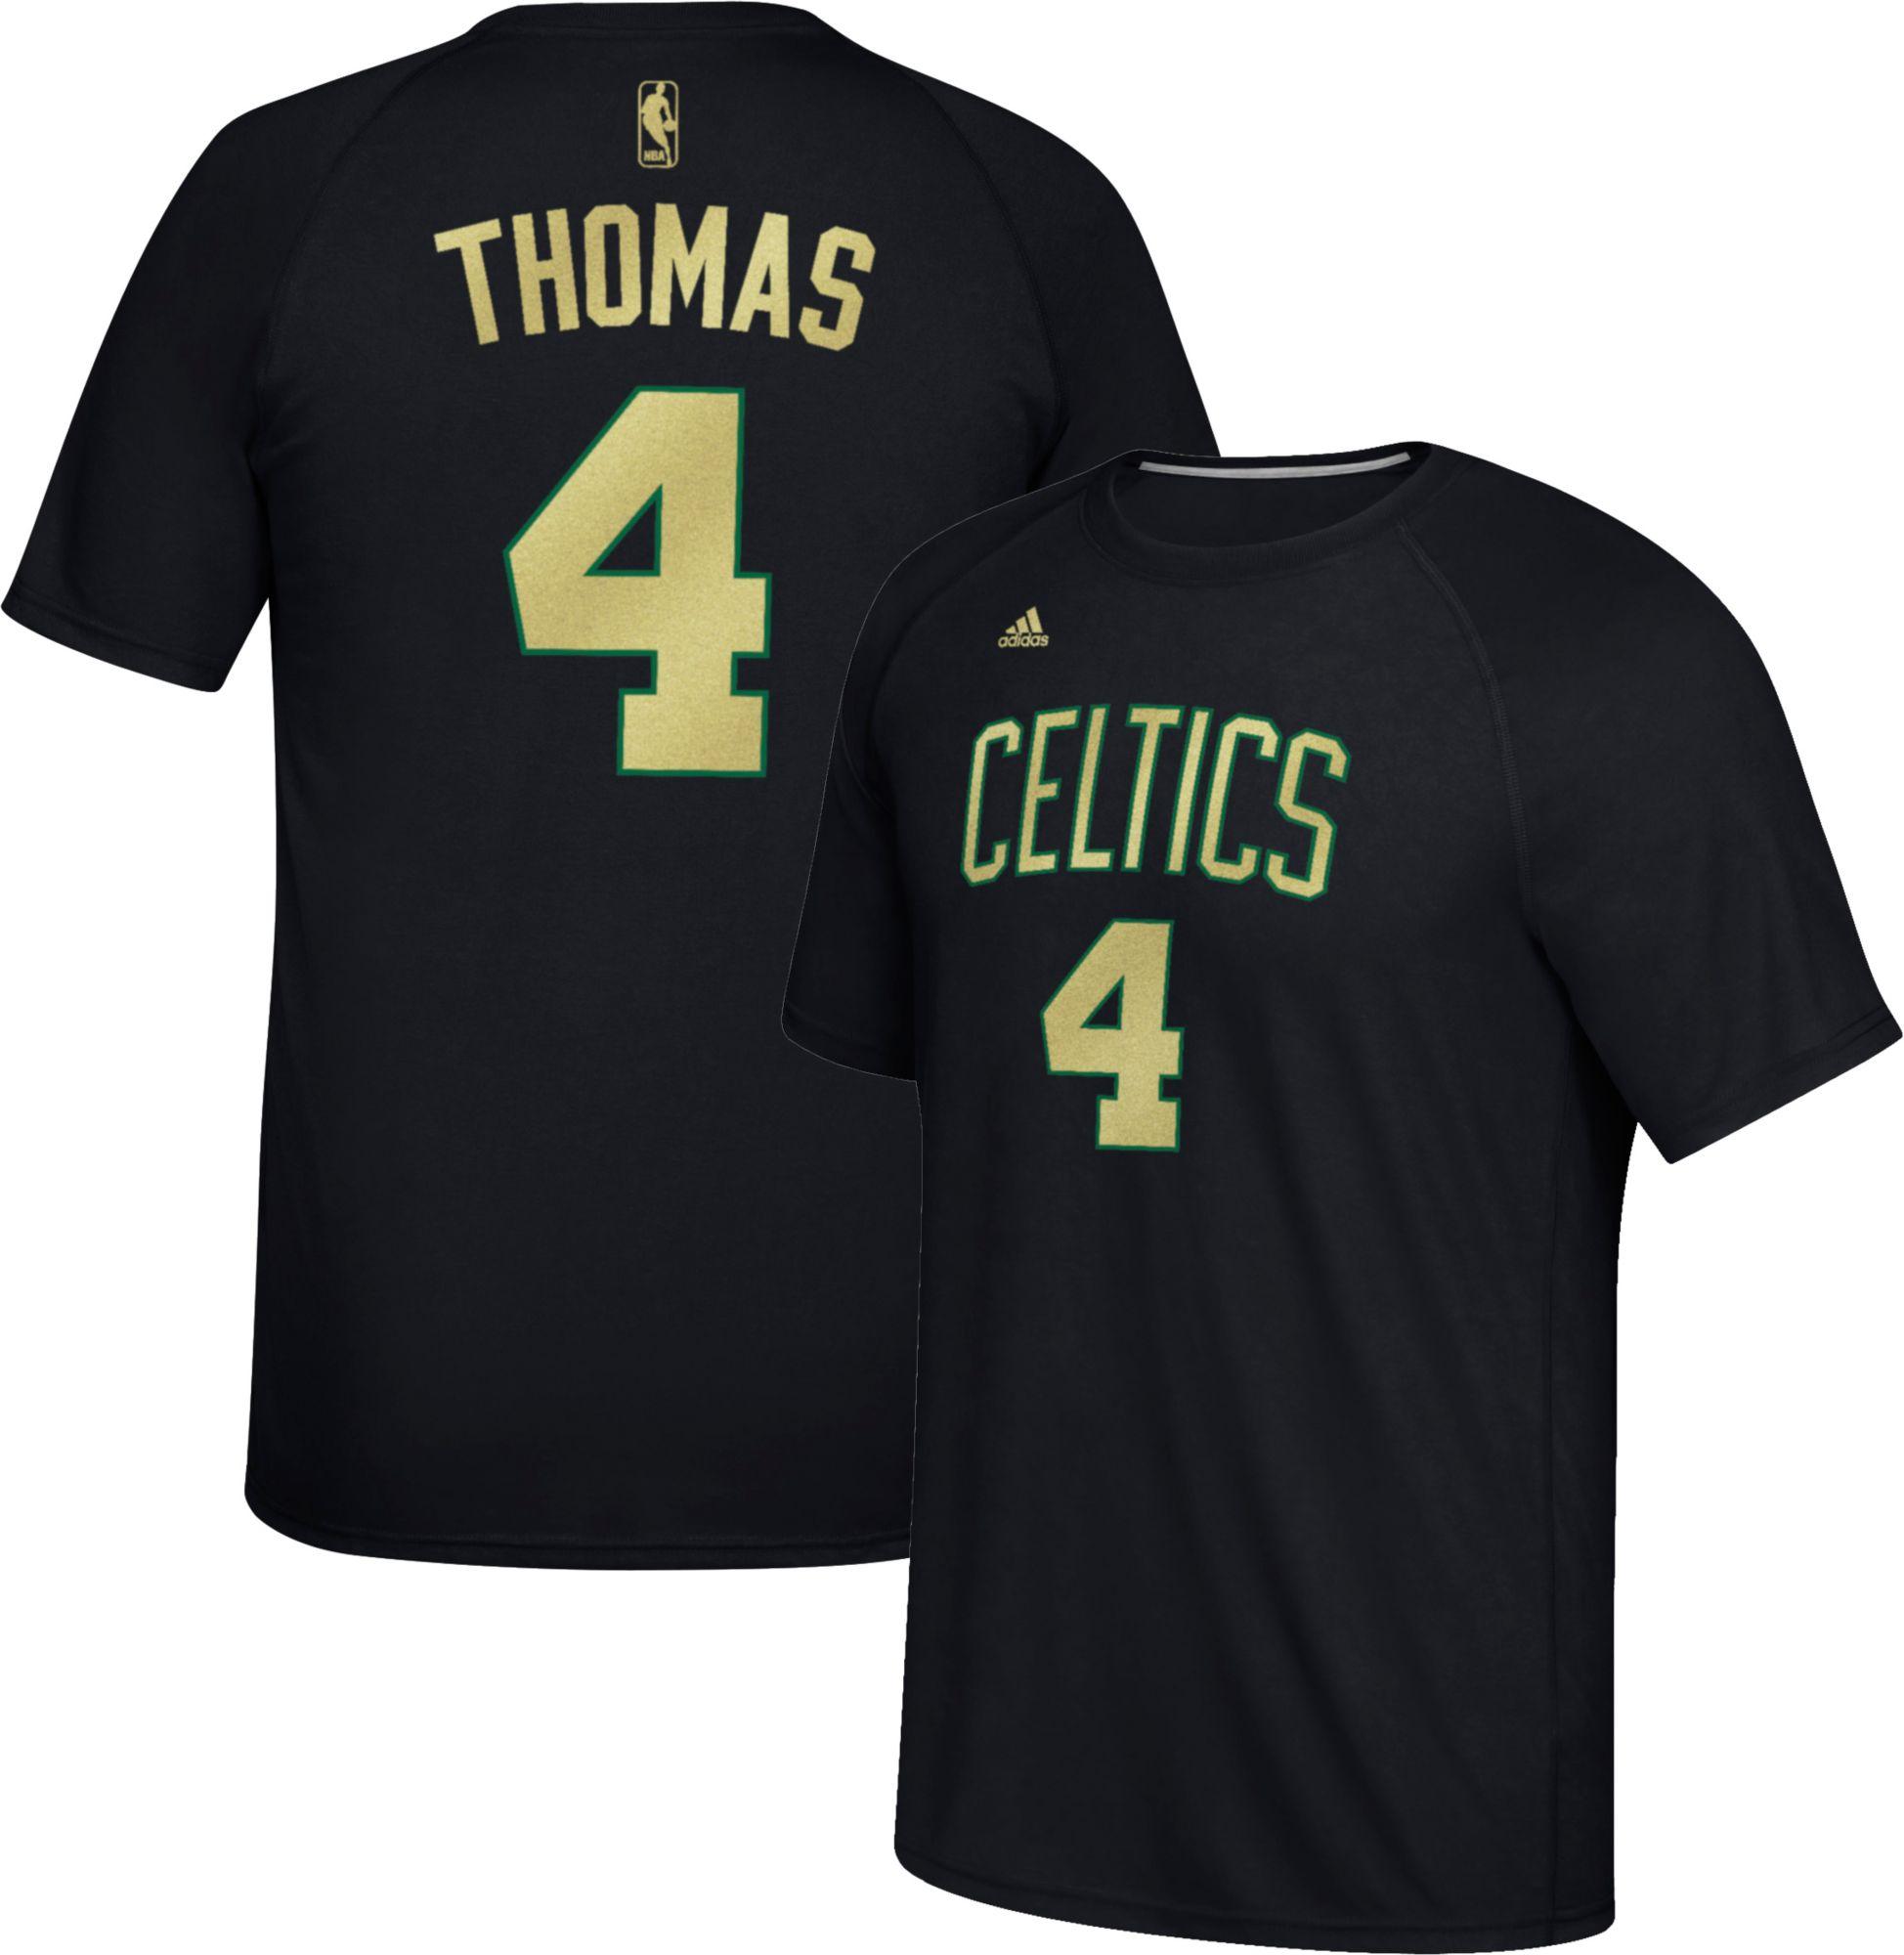 22c91e321669 ... promo code for jersey adidas youth boston celtics isaiah thomas 4 black  performanc 049c1 80b45